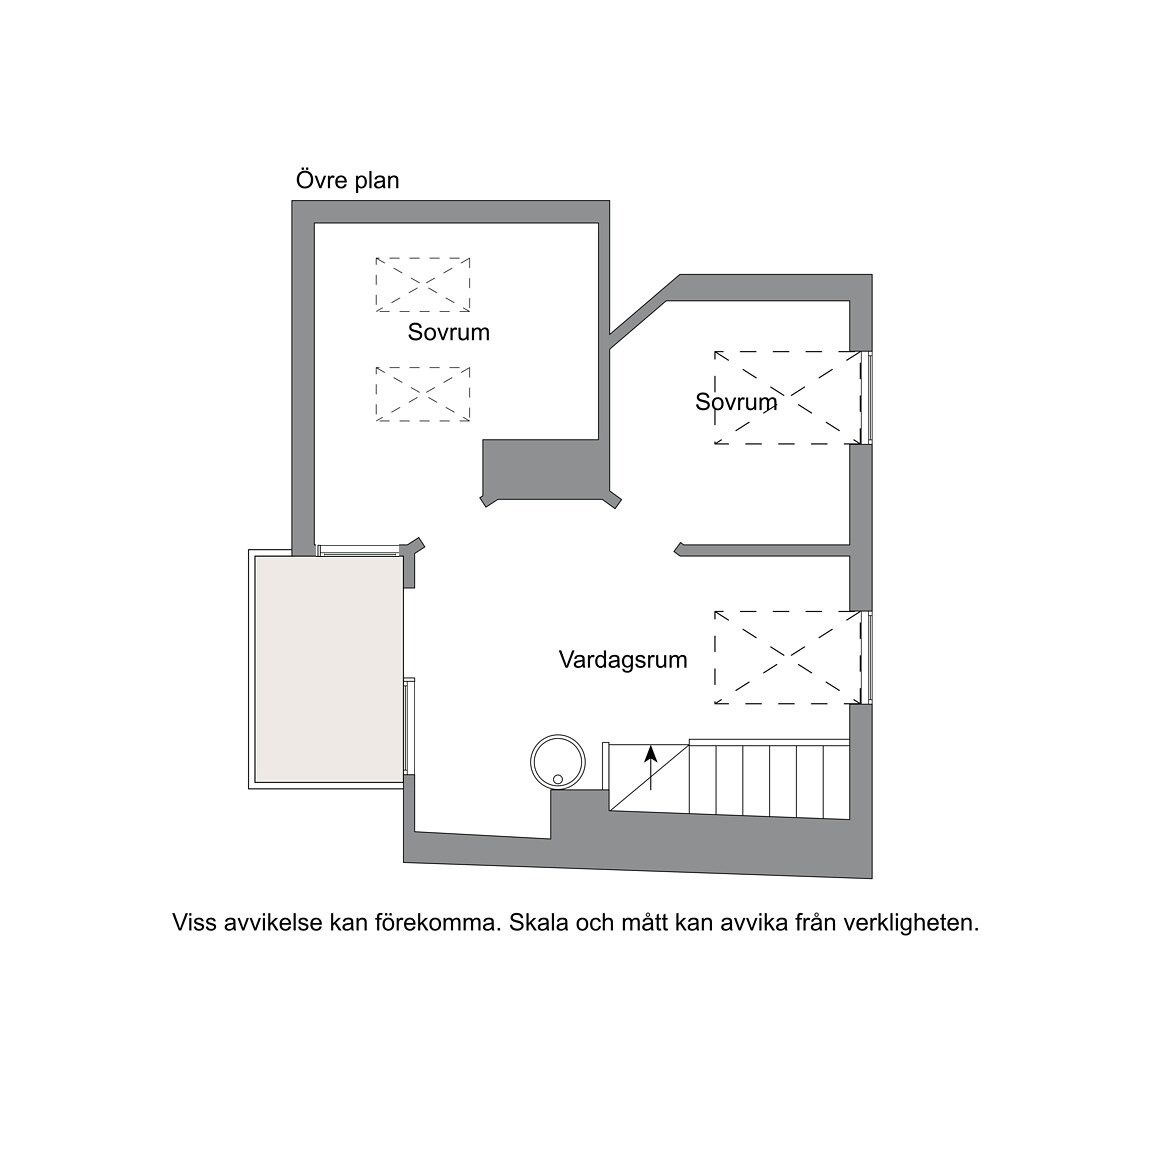 планировка-двухуровневая-квартира-110-квм-2